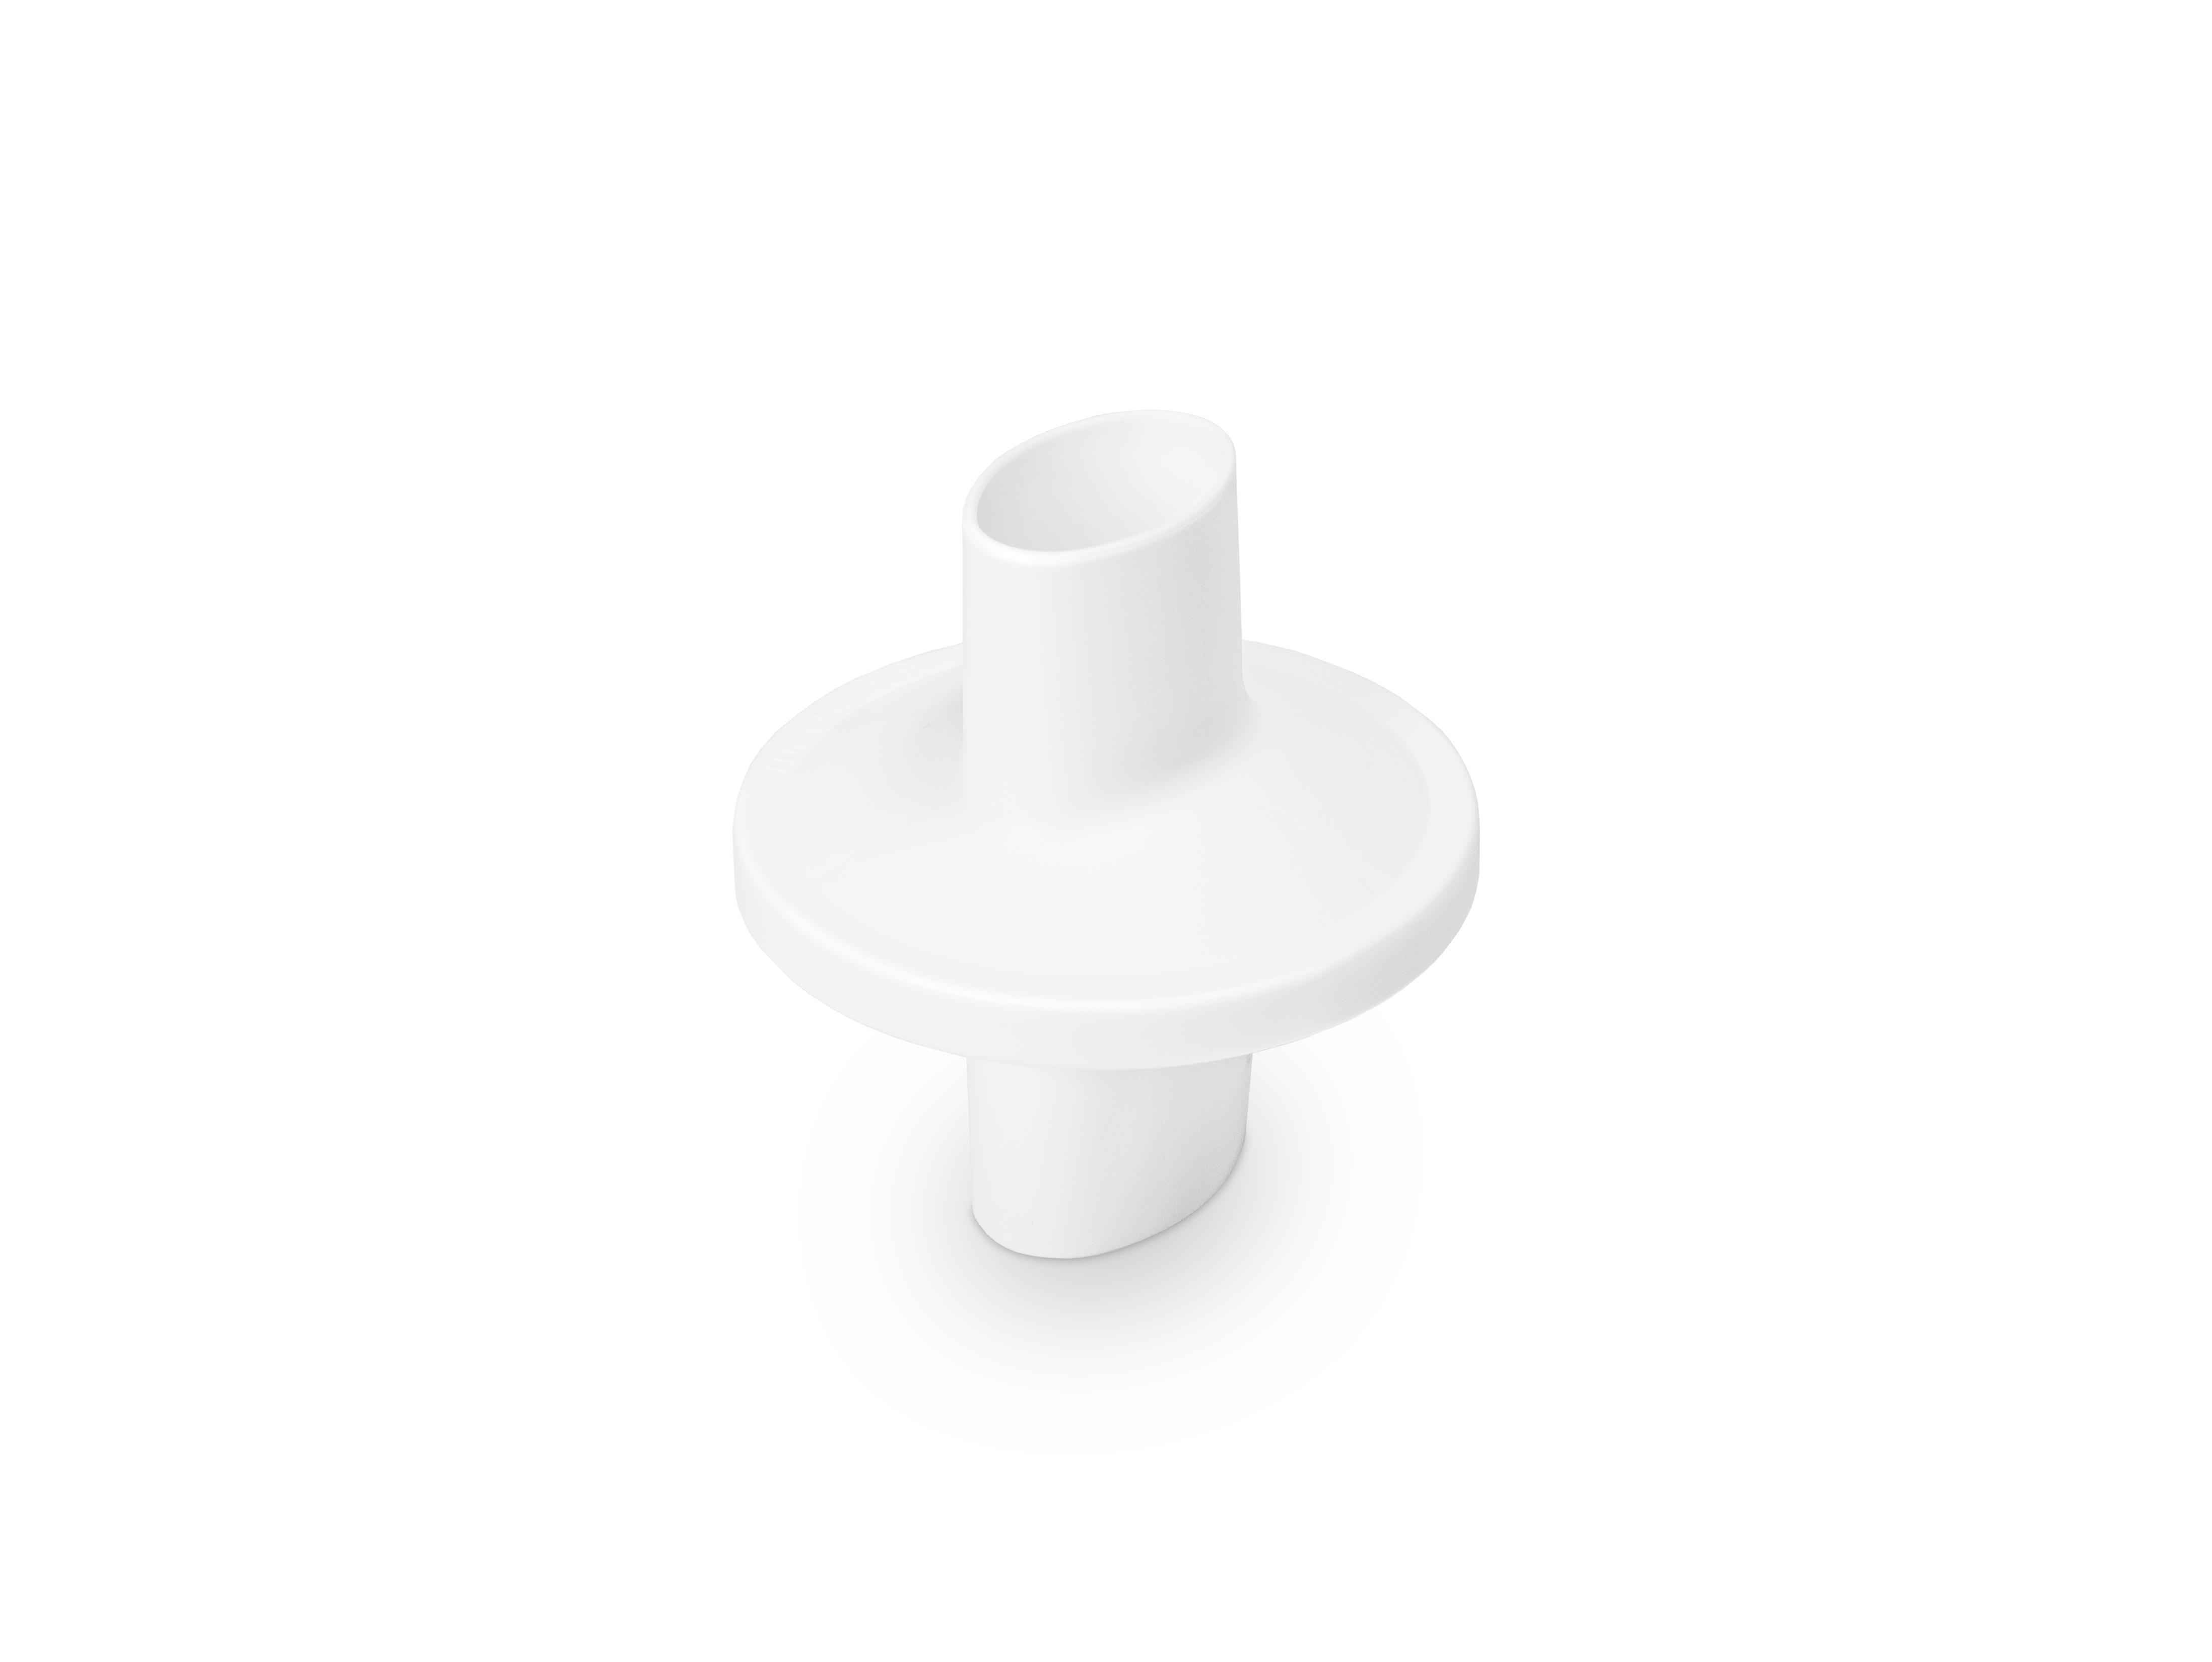 MESI SPIRO - filtre embout buccal (10 pcs)